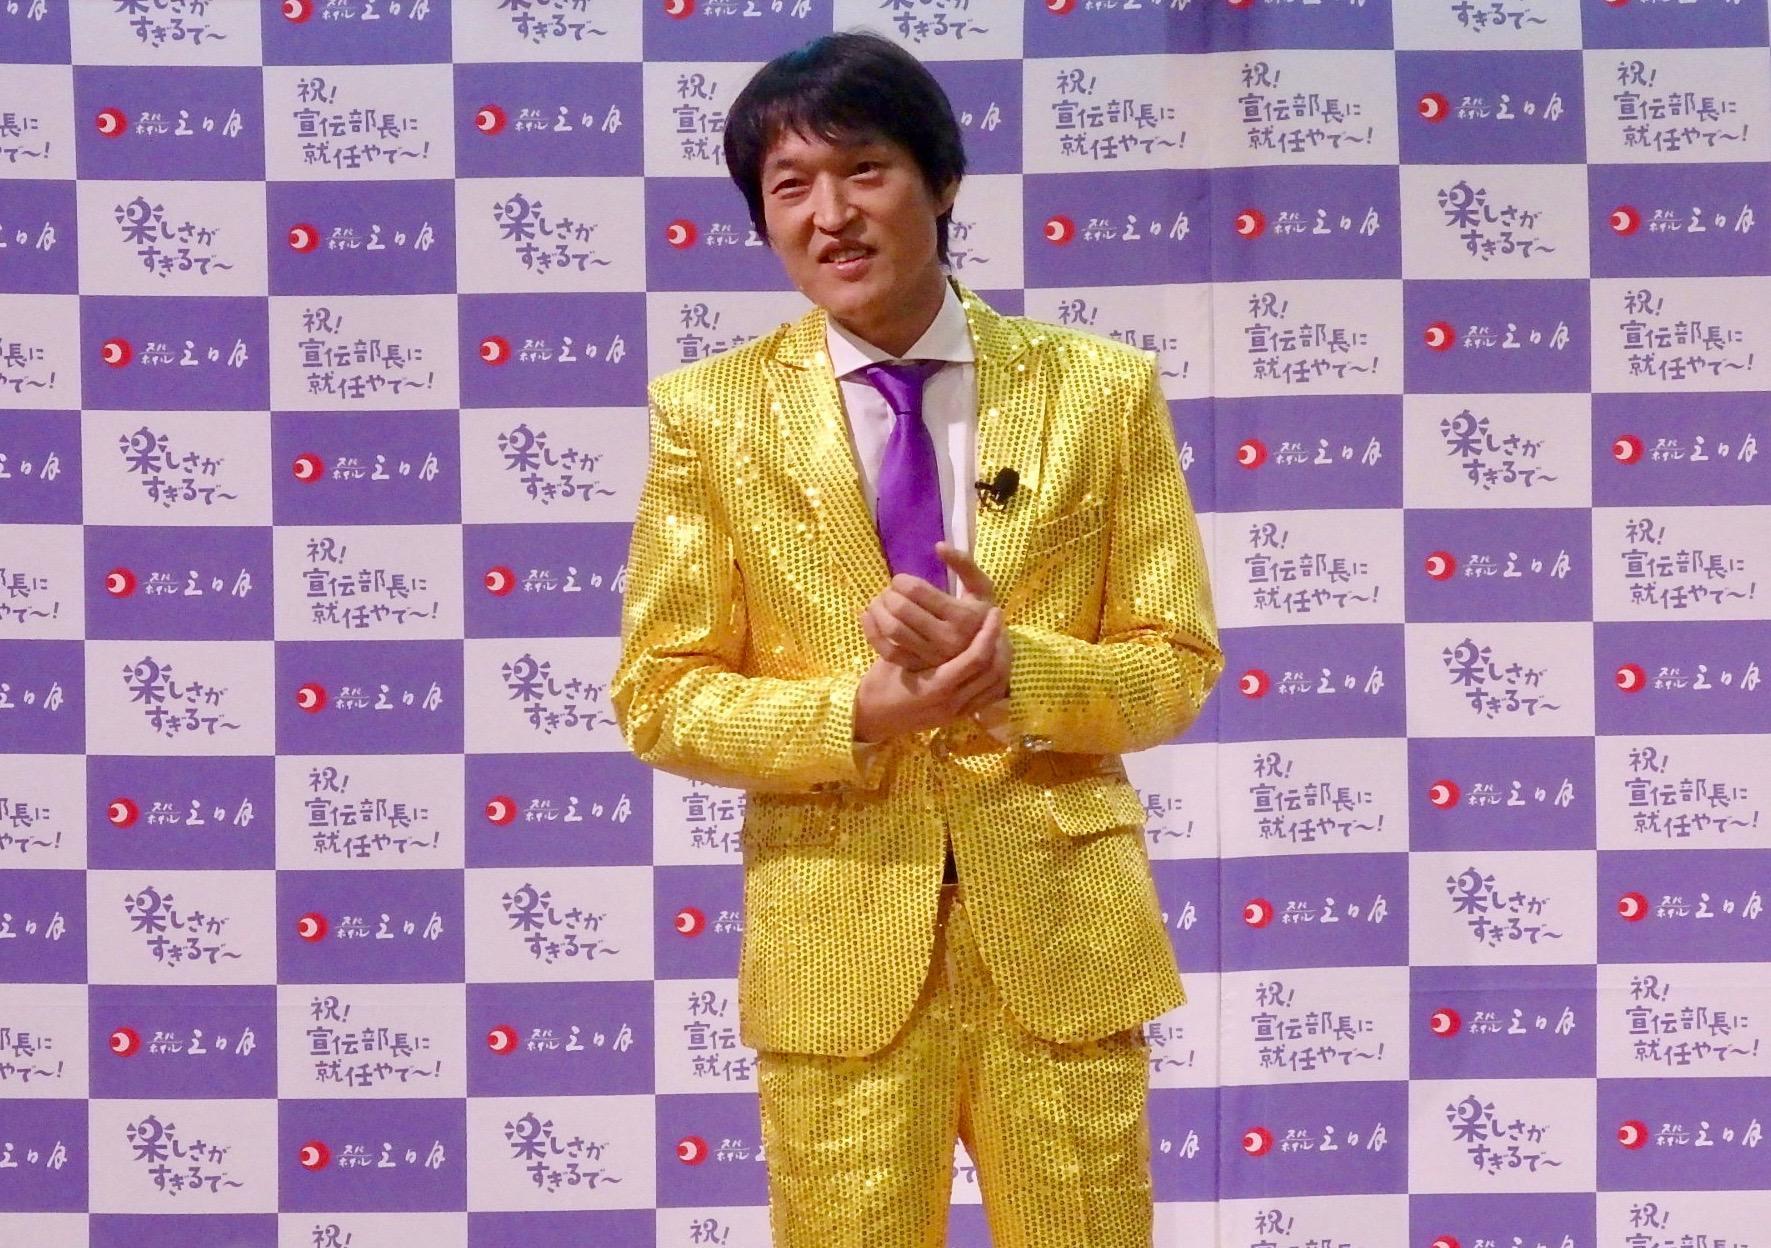 http://news.yoshimoto.co.jp/20180628202508-6f9cb8d3711498eb02b9086fee777db146ea7af5.jpg